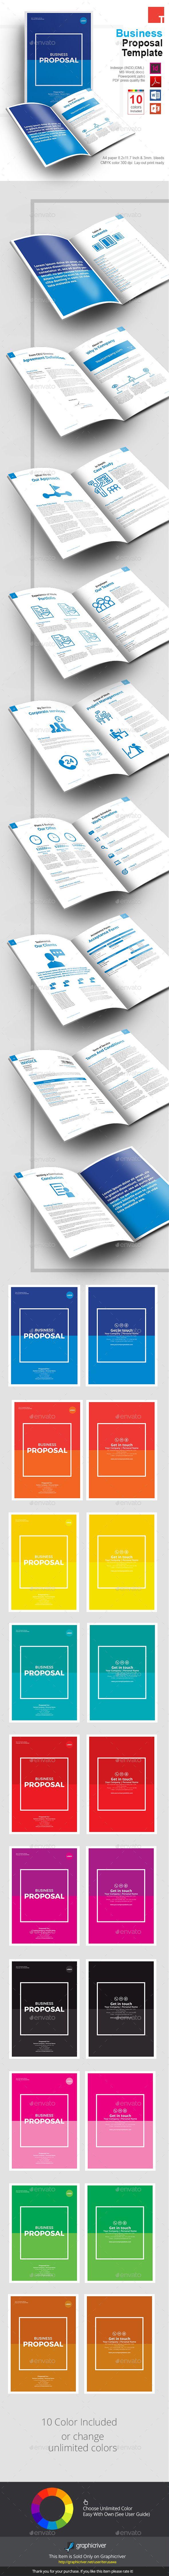 25 best ideas about proposal templates on pinterest report design leaflet design template. Black Bedroom Furniture Sets. Home Design Ideas